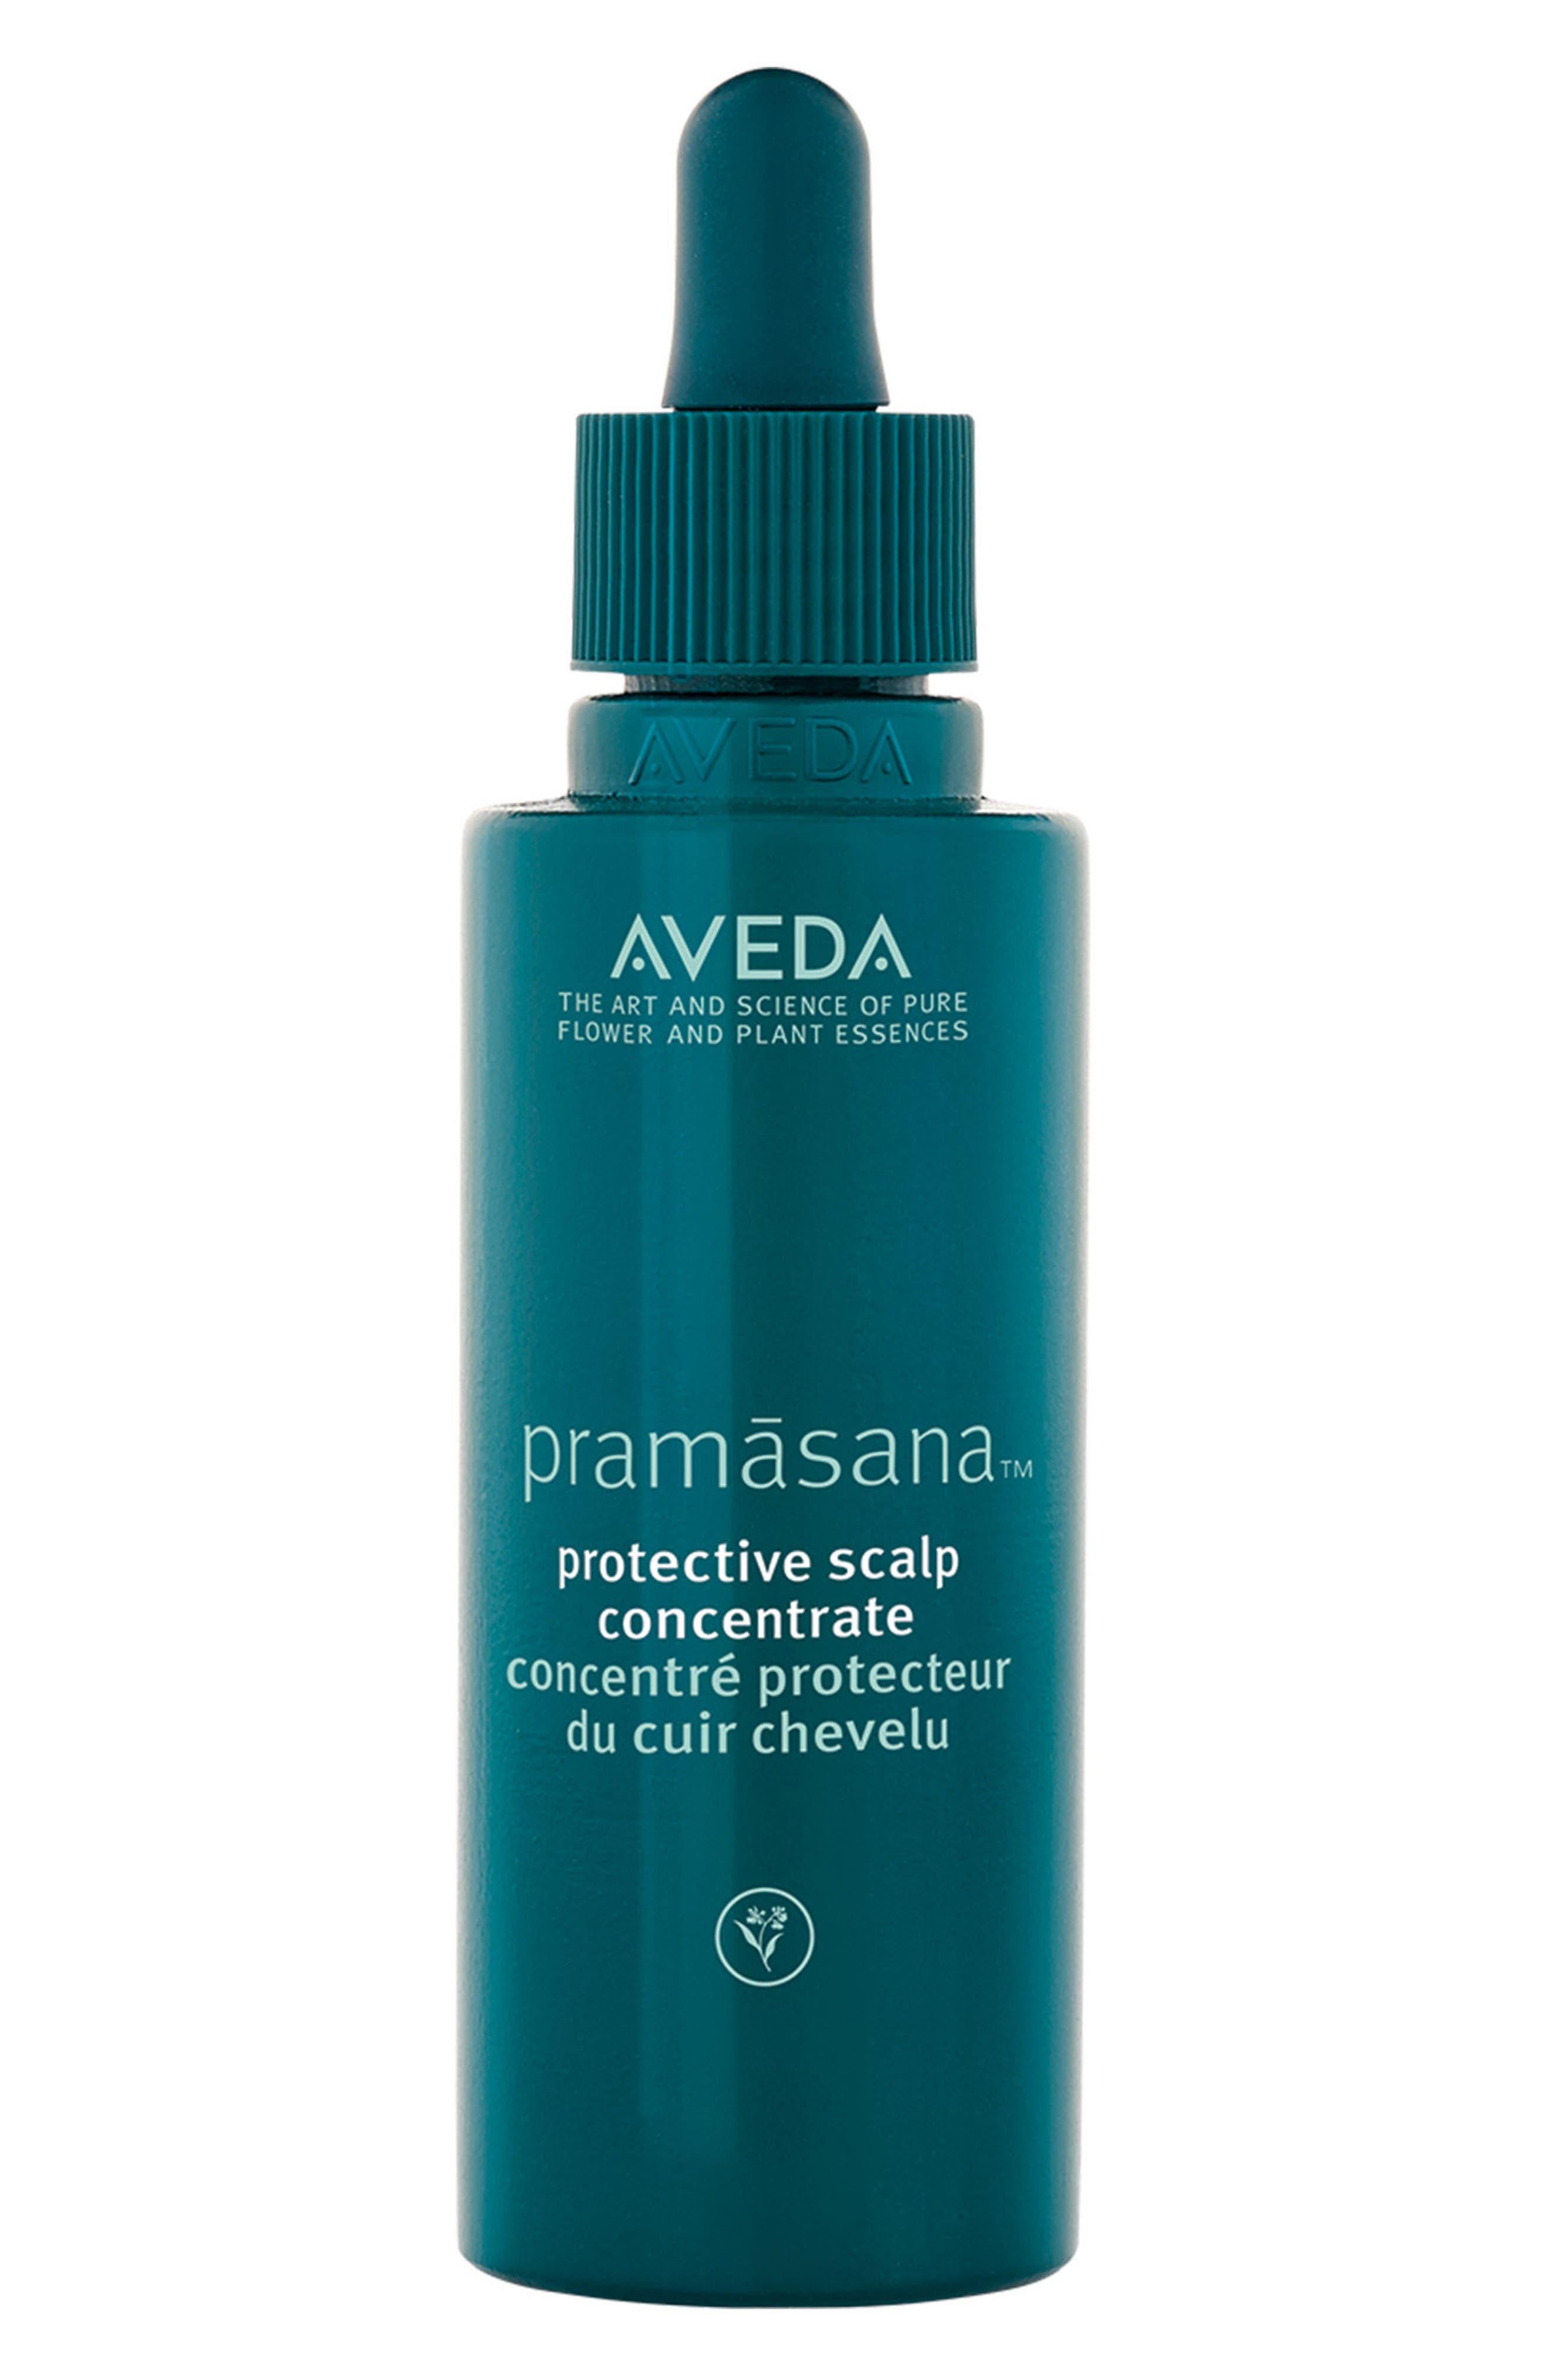 pramasana<sup>™</sup> Protective Scalp Concentrate,                             Main thumbnail 1, color,                             NO COLOR